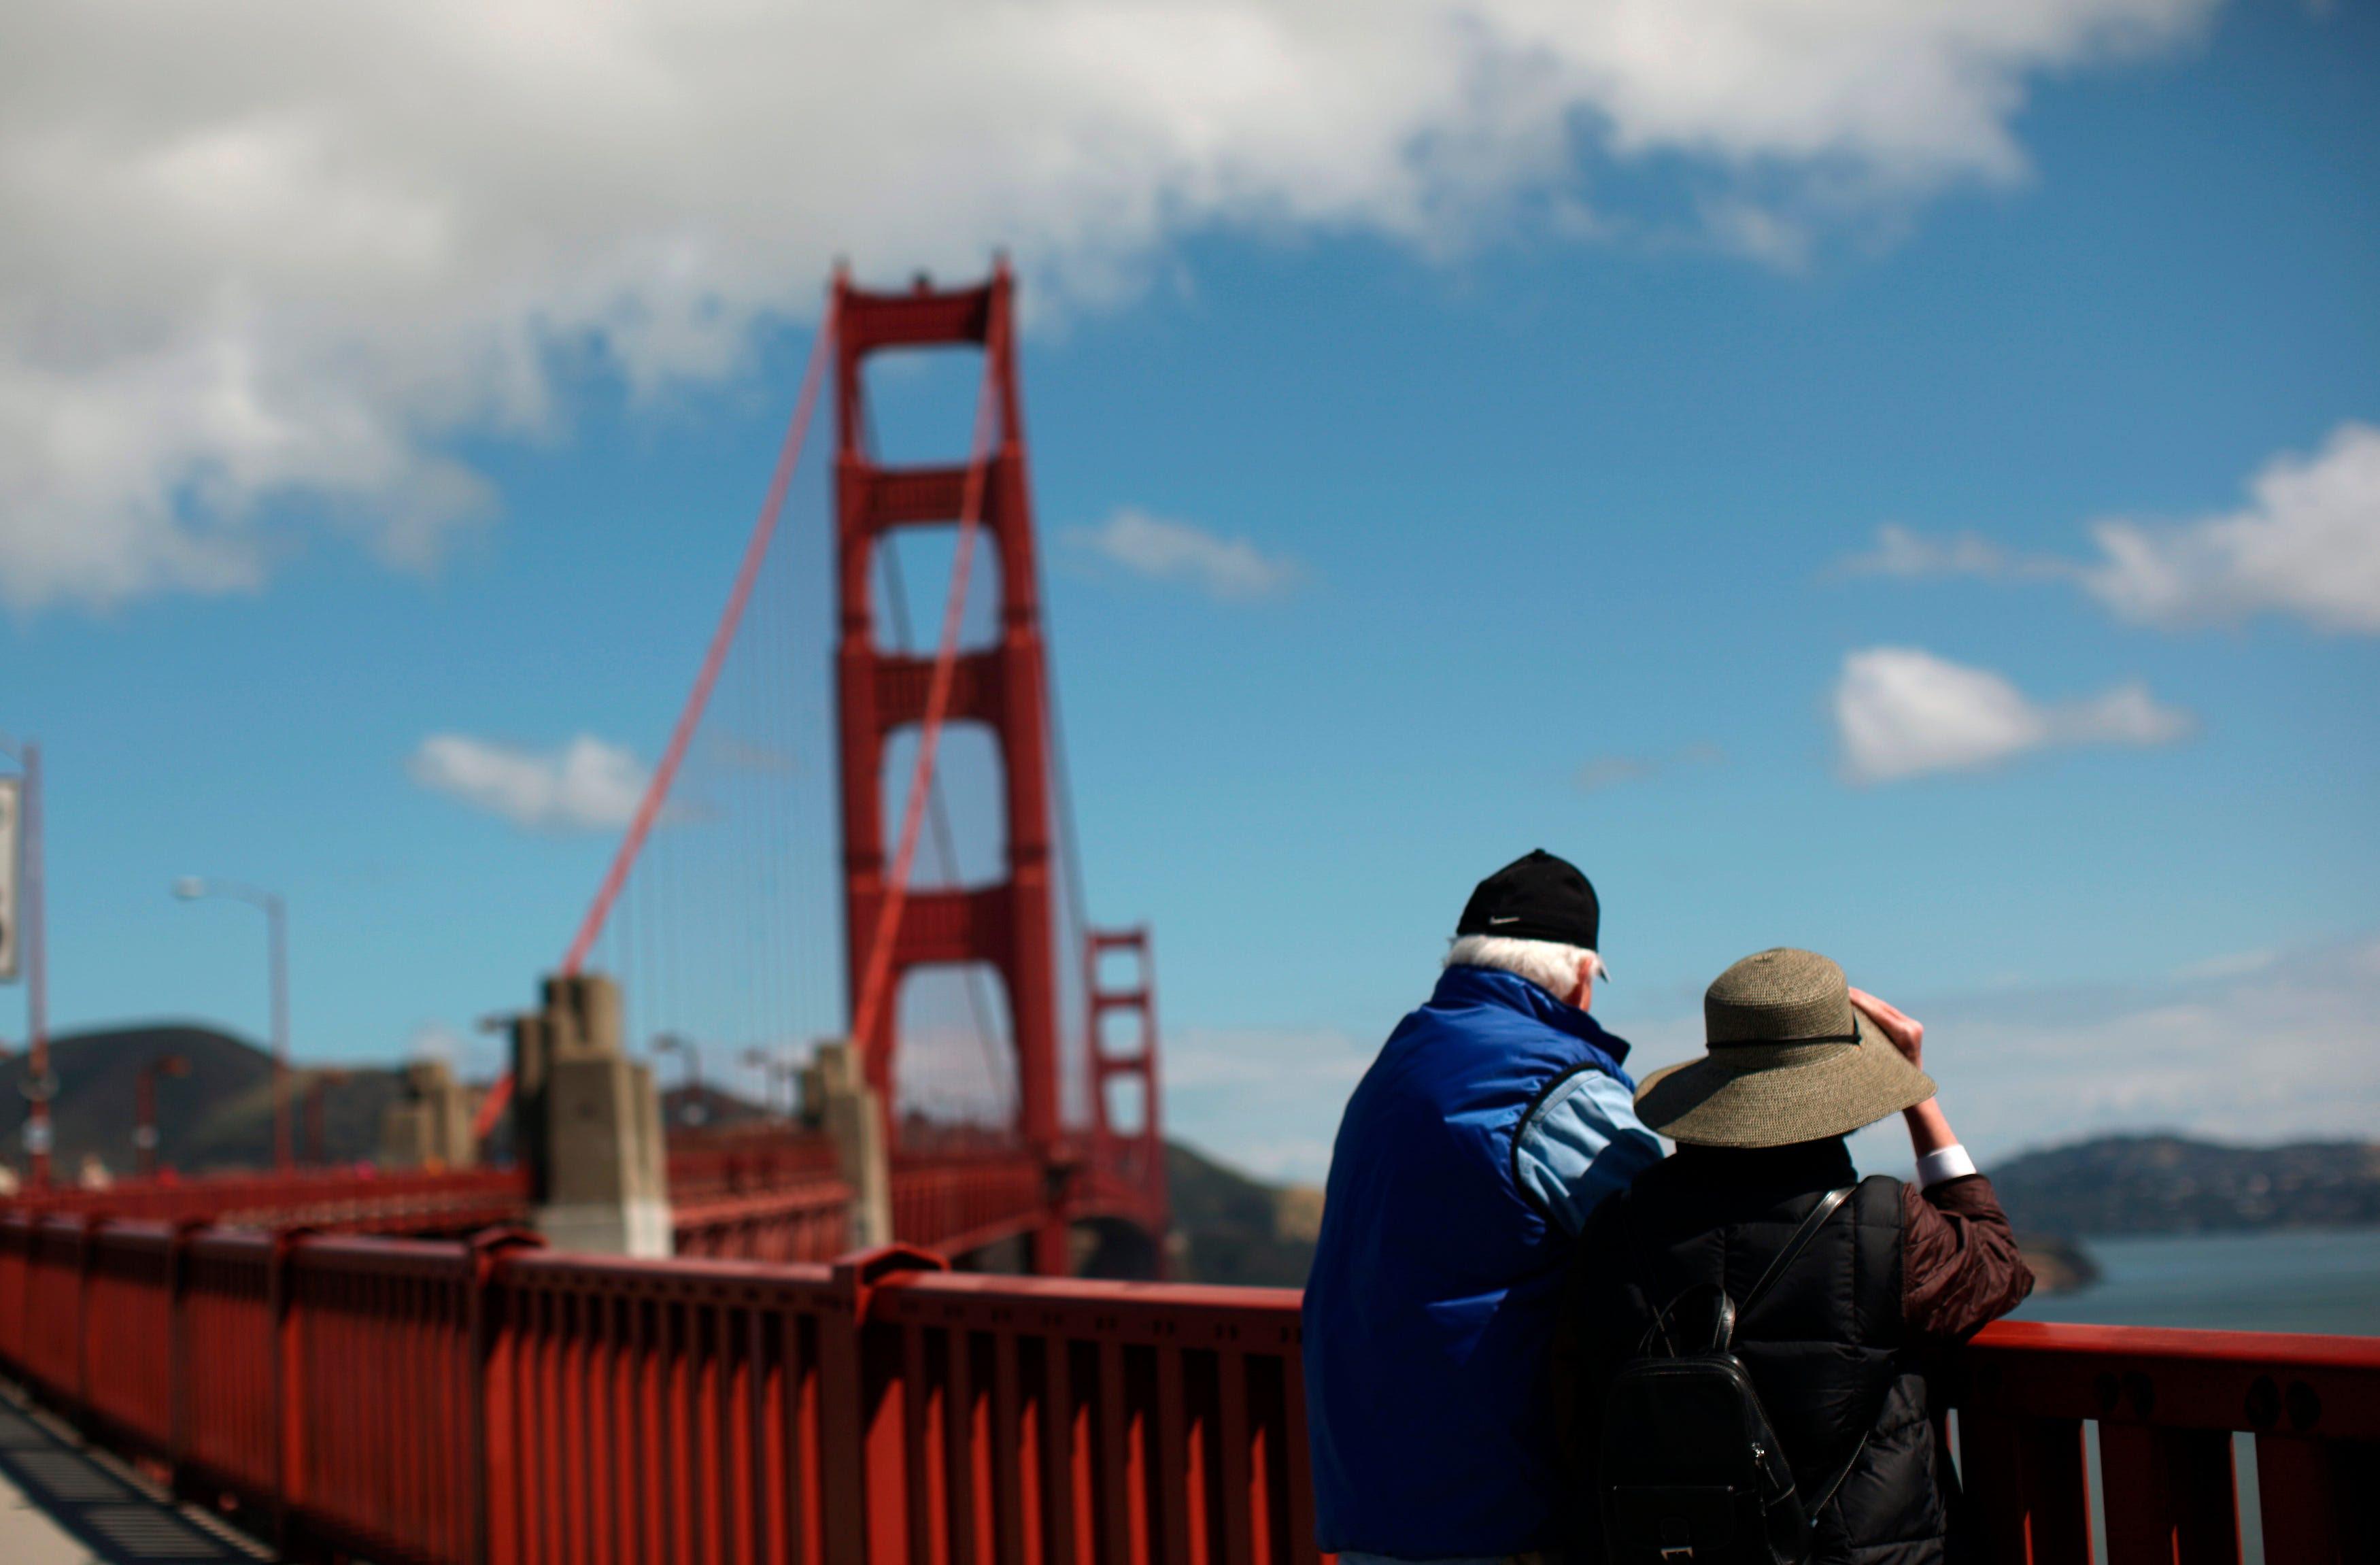 Golden Gate Bridge San Francisco California USA America Relationship Couple